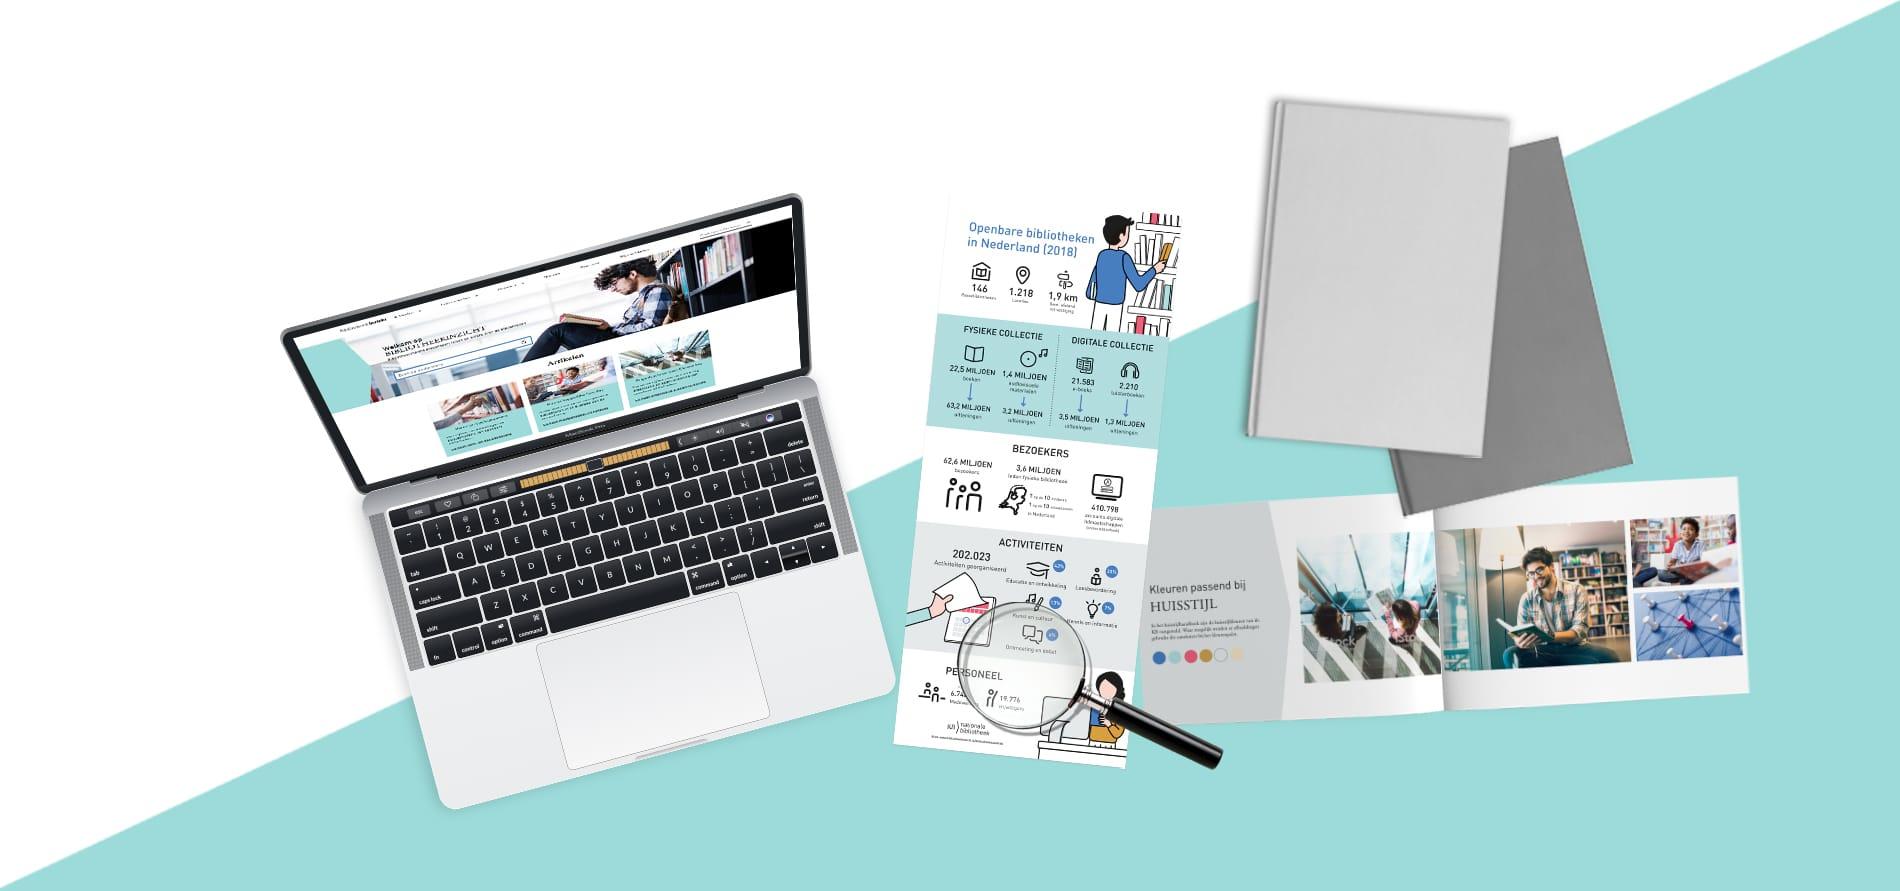 KoninklijkeBibliotheek_Freelance_ux-visual-designer2